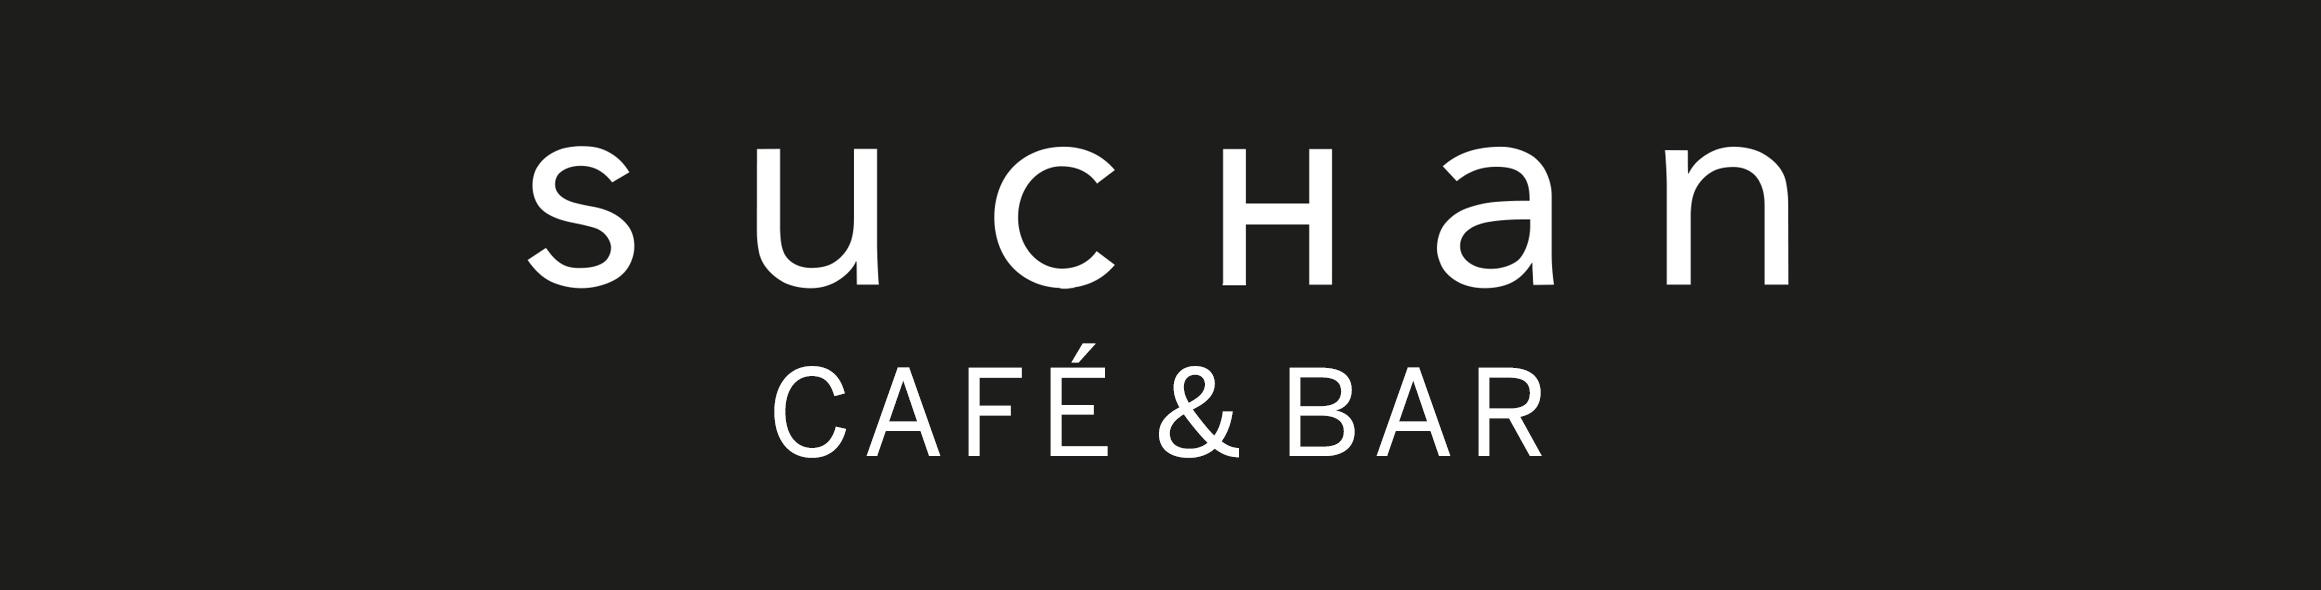 Suchan Café & Bar